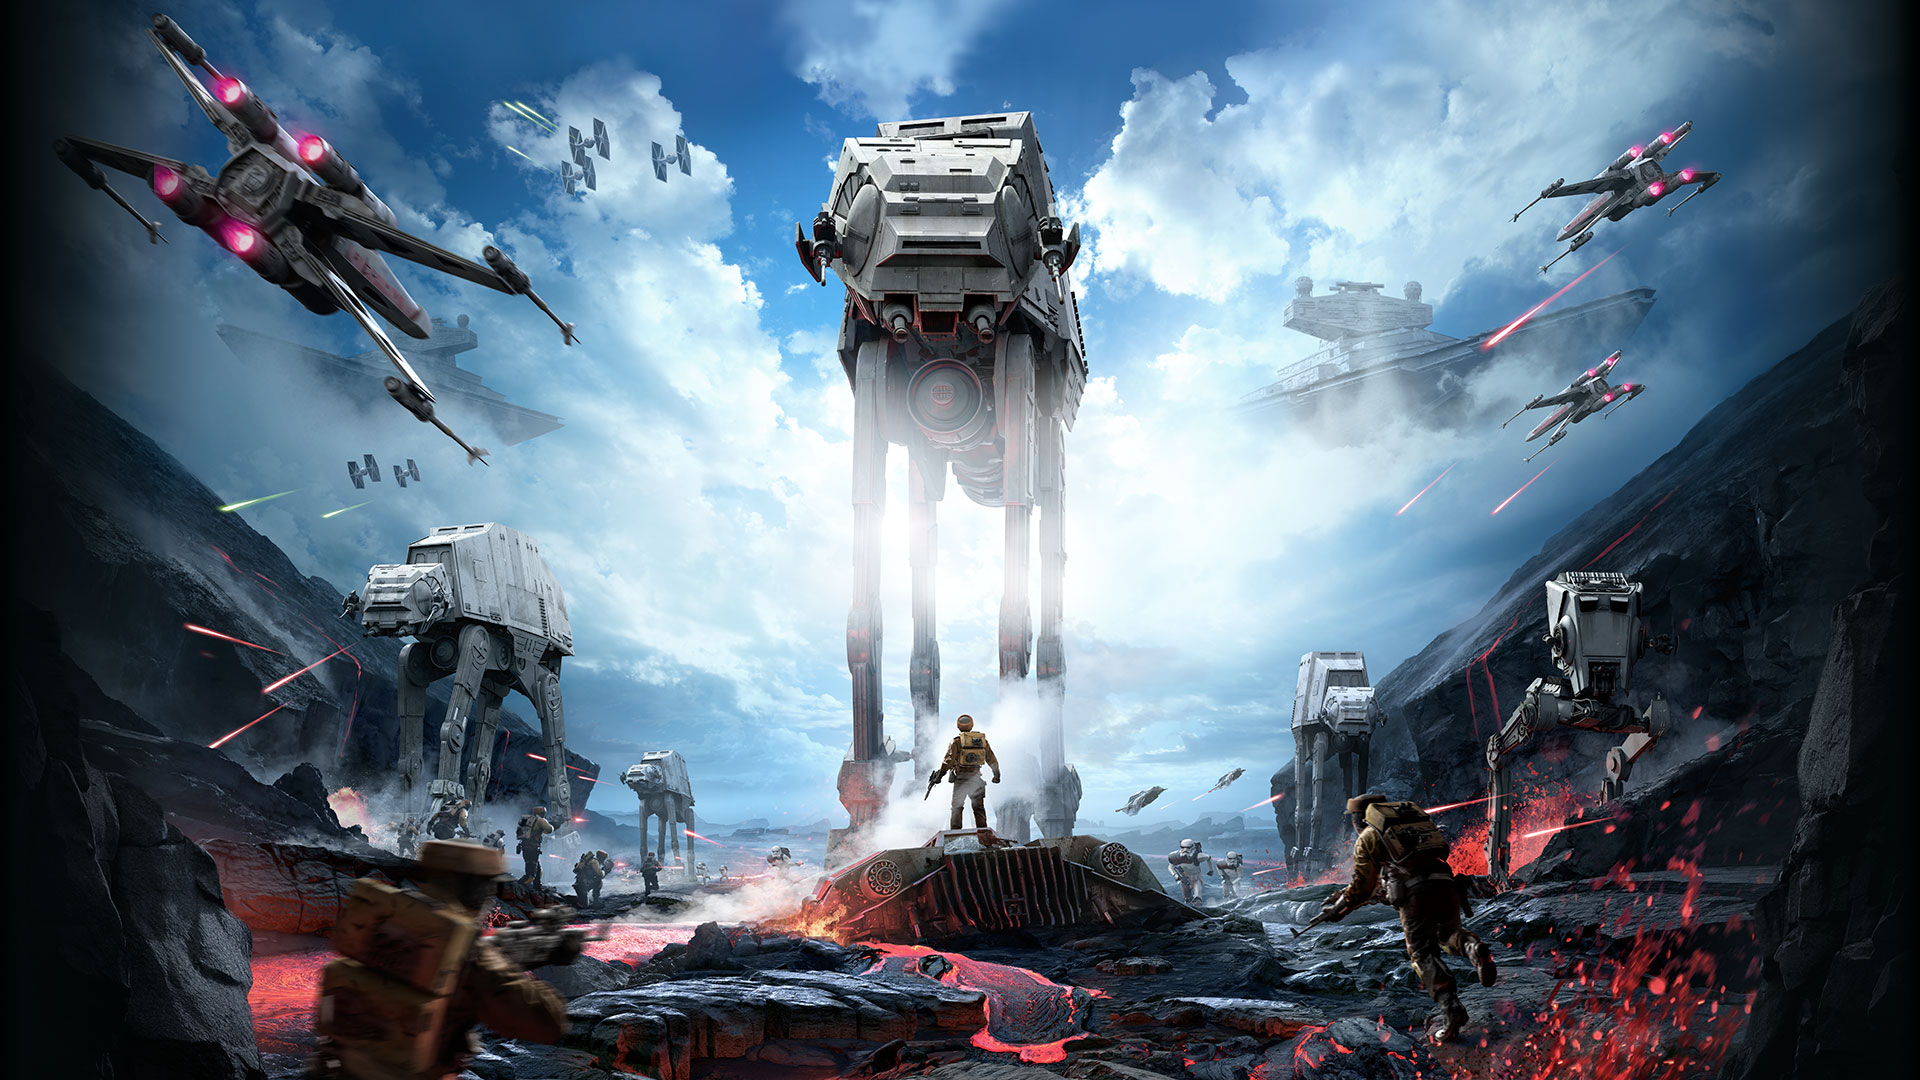 Star Wars Battlefront No Logo Hd Wallpaper Star Wars Windows Background 1790497 Hd Wallpaper Backgrounds Download